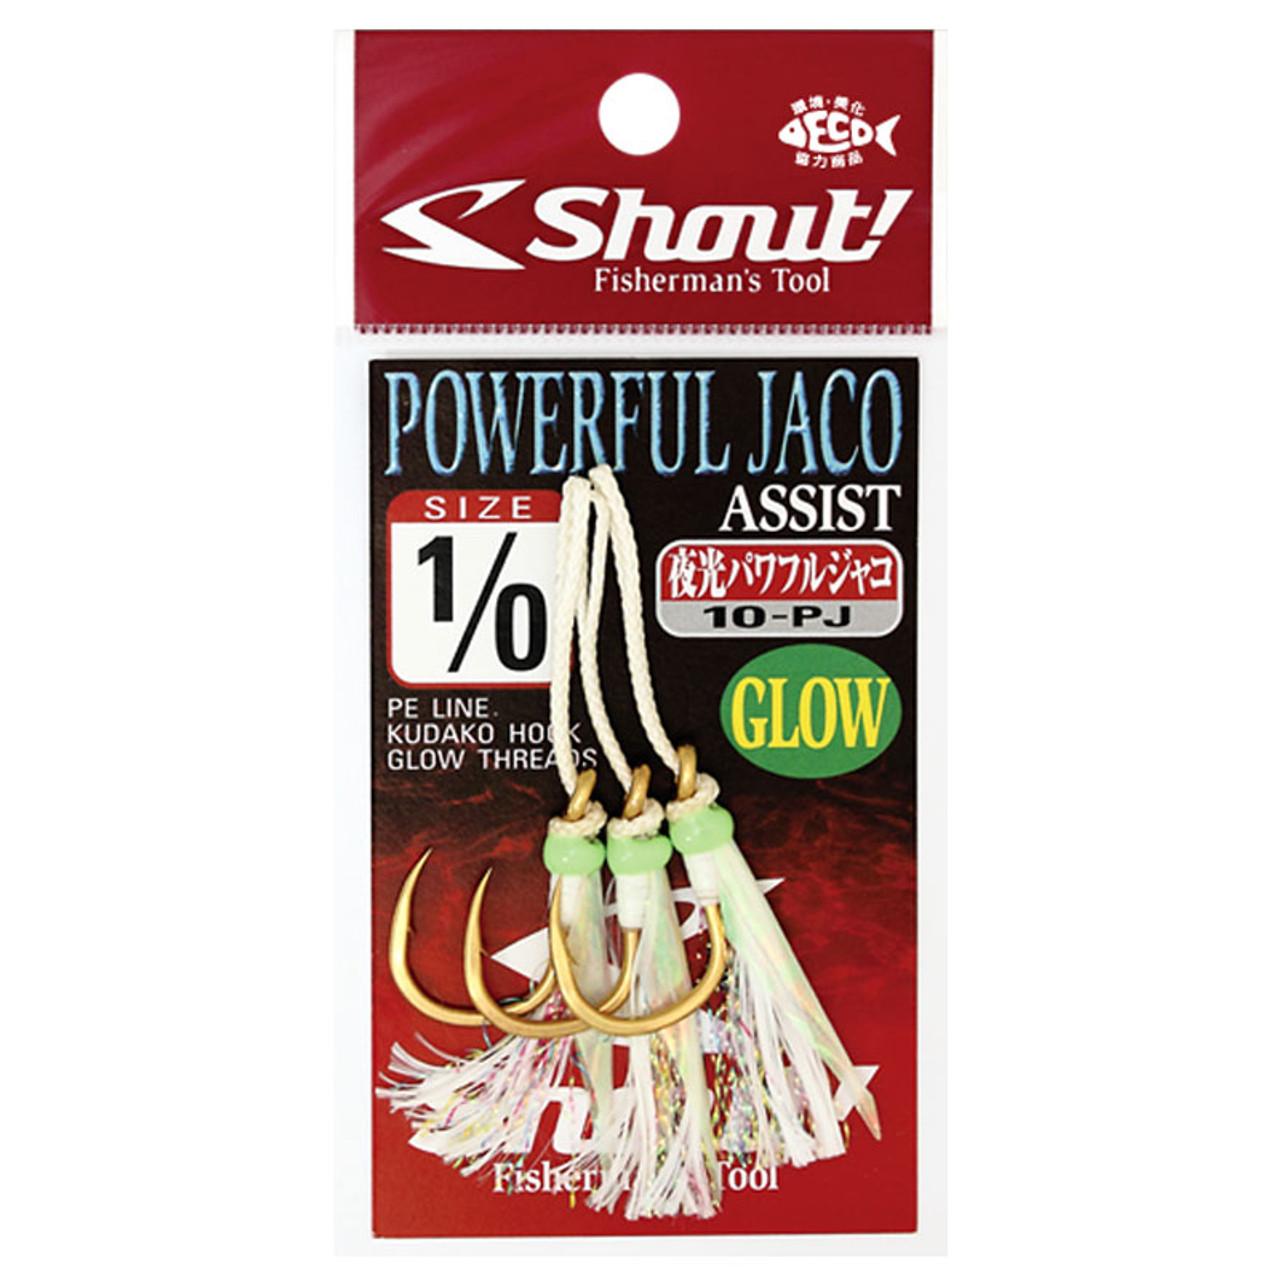 Shout Powerful Jaco 08-PJ Assist Hooks Kudako Tackle Jigging Sizes 4//0 5//0